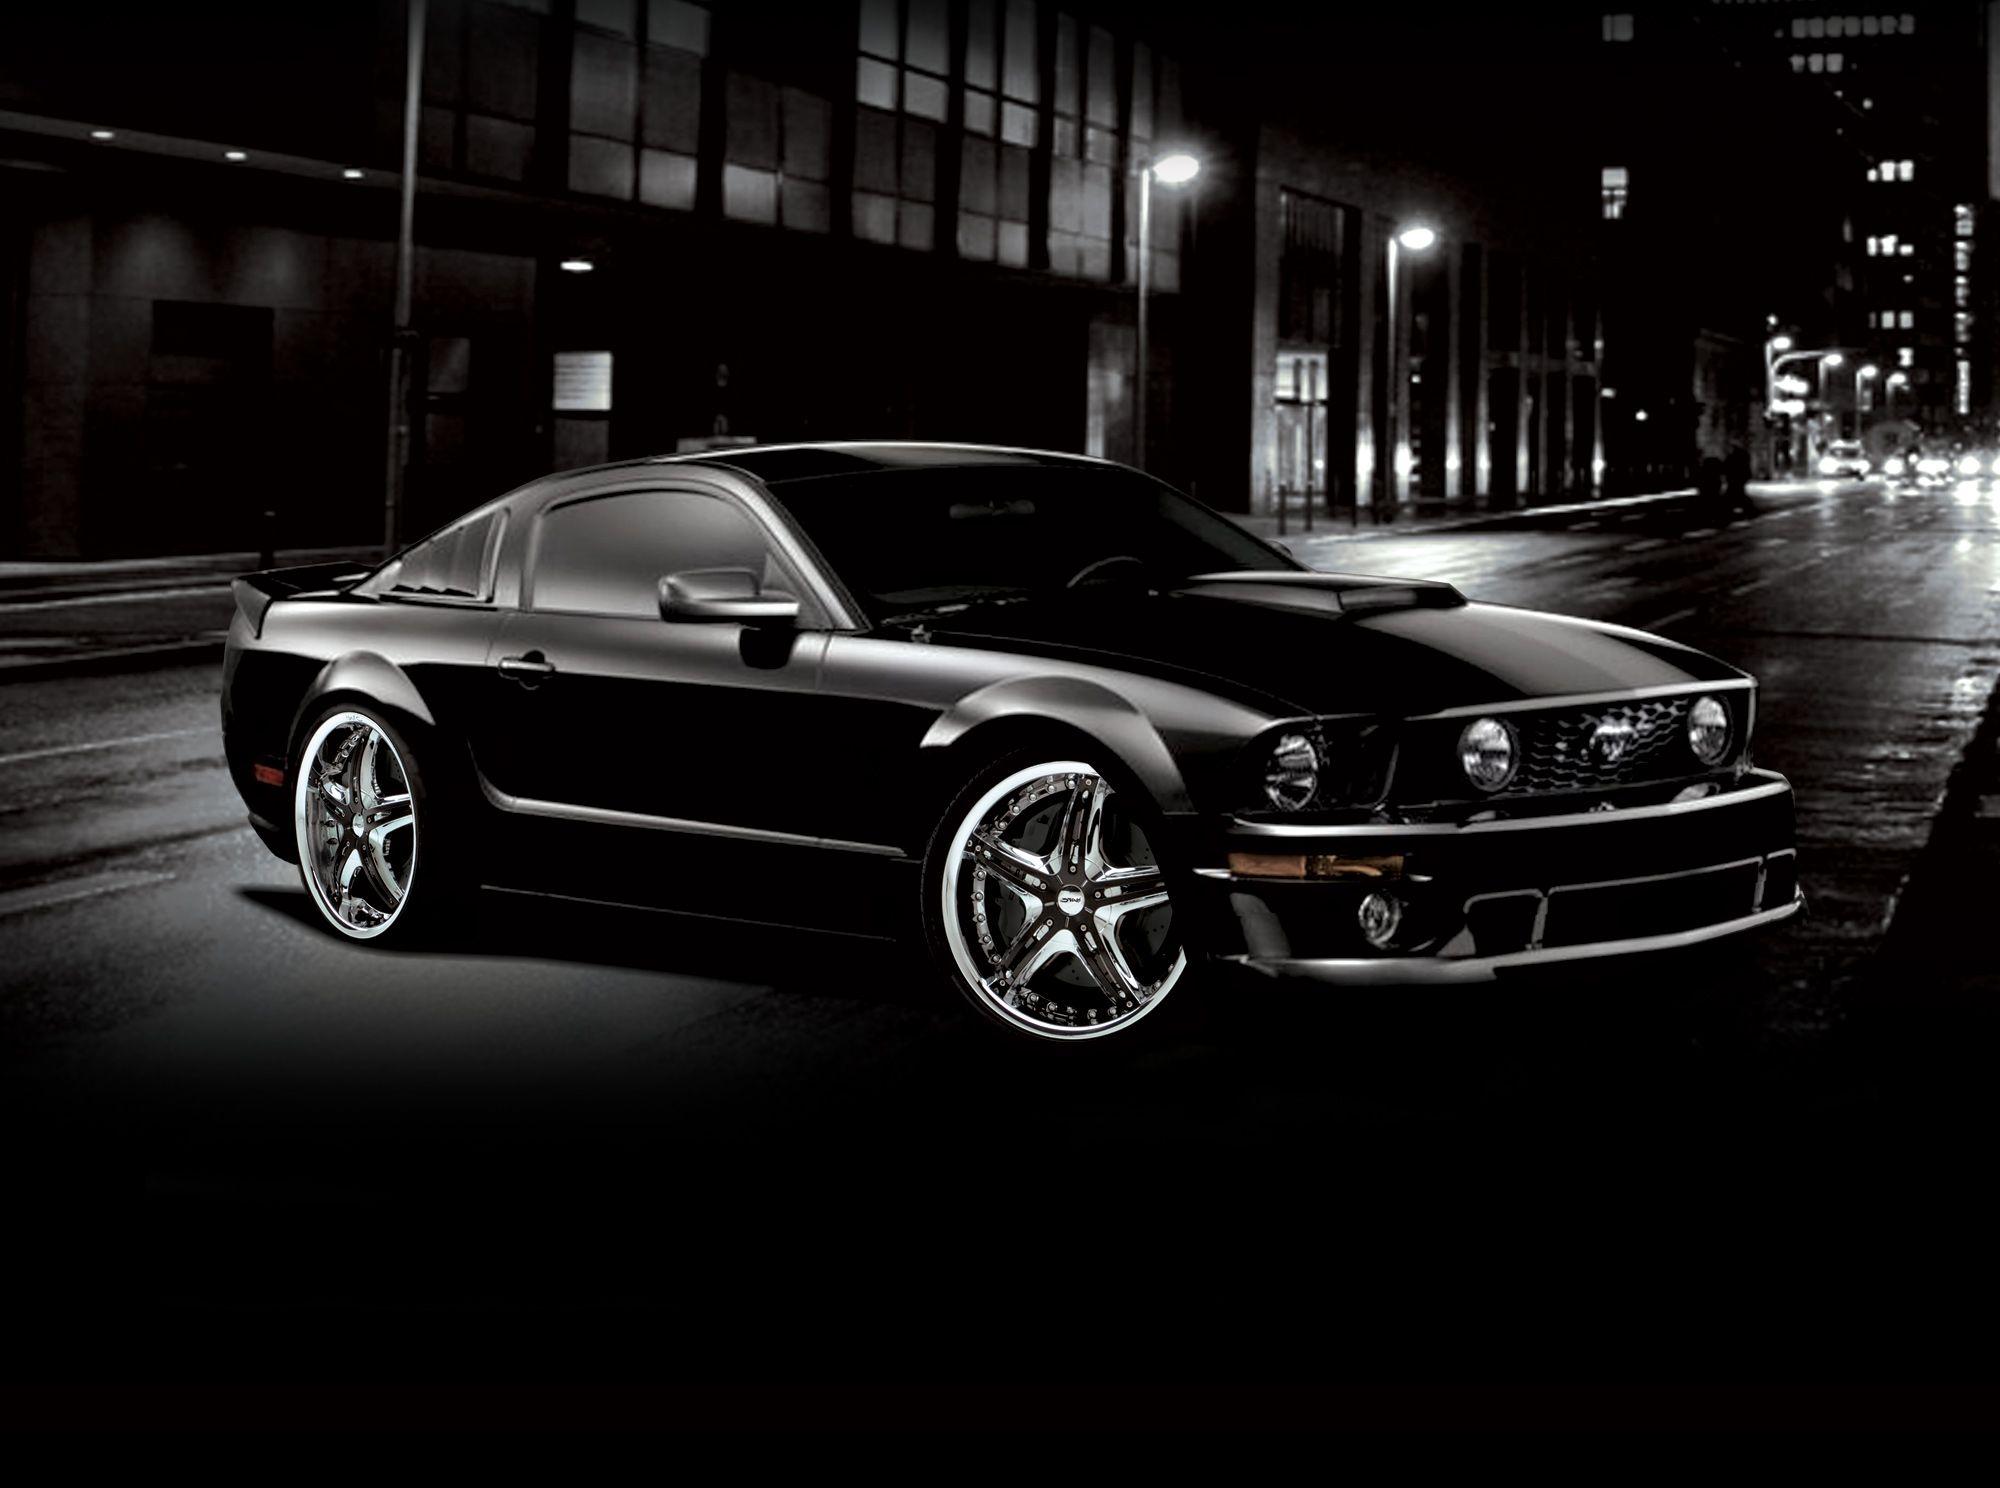 Black Mustang with D'vinci Wheels Dream car garage